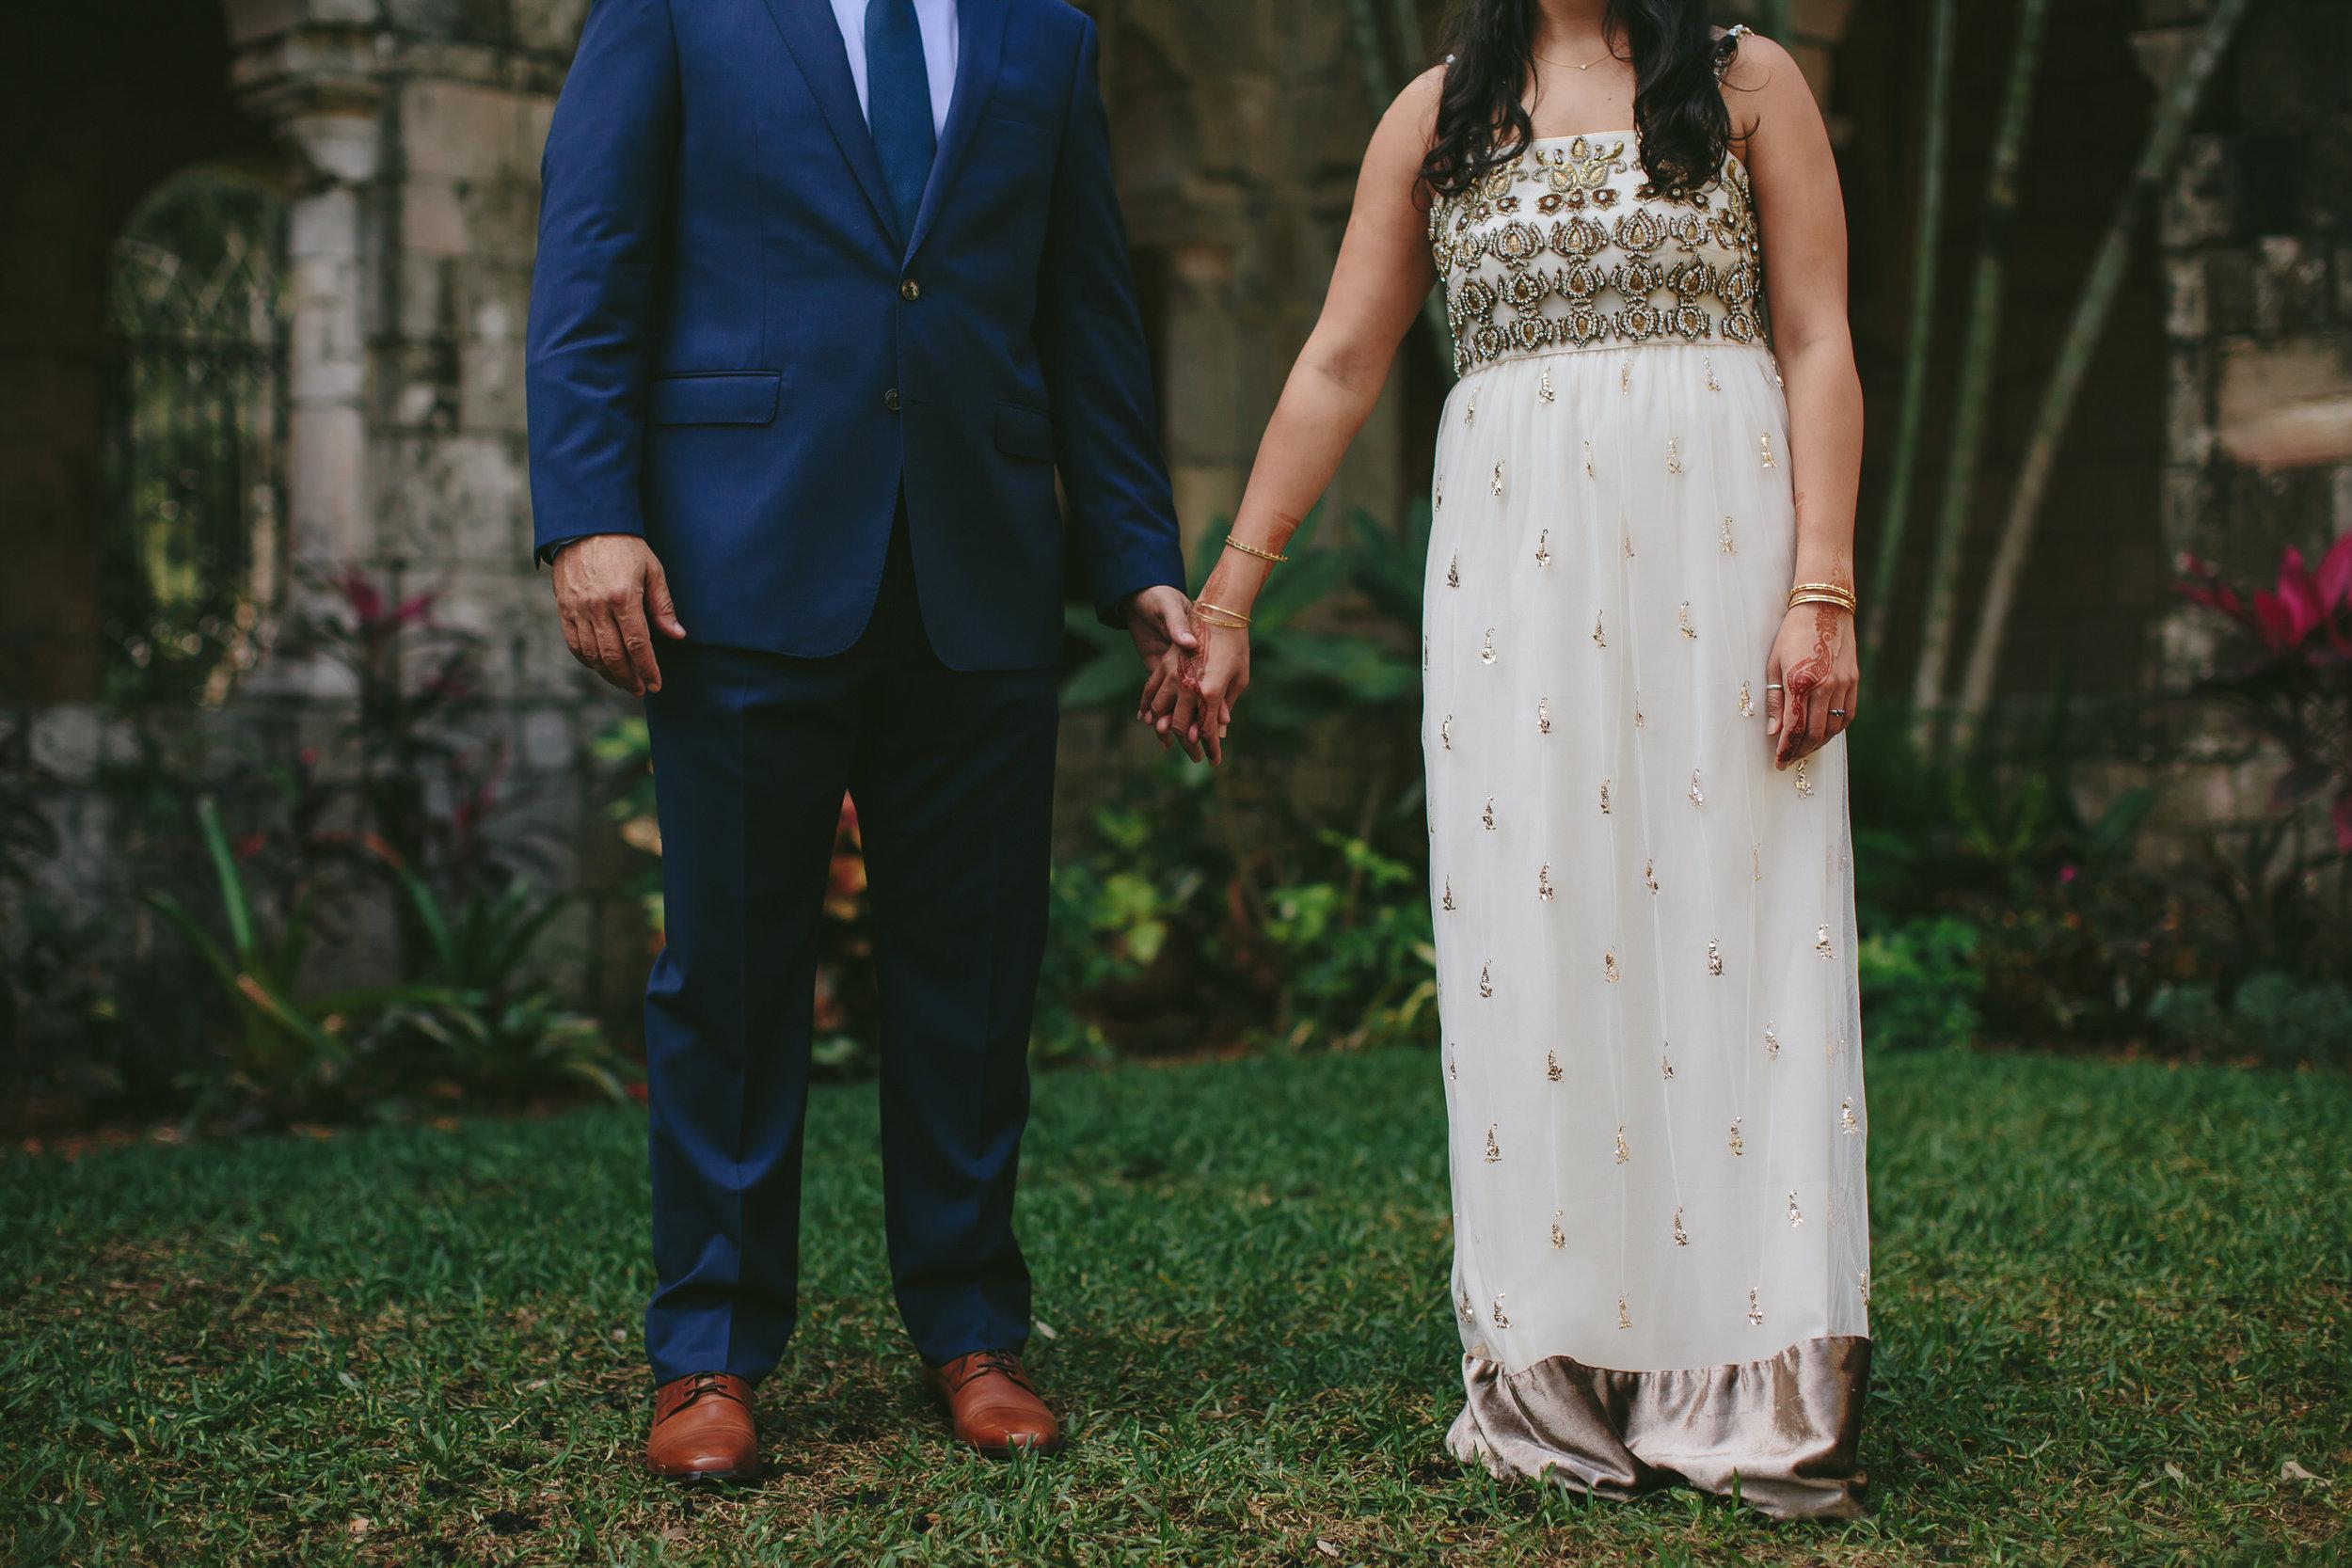 holding-hands-wedding-couple-tiny-house-photo.jpg